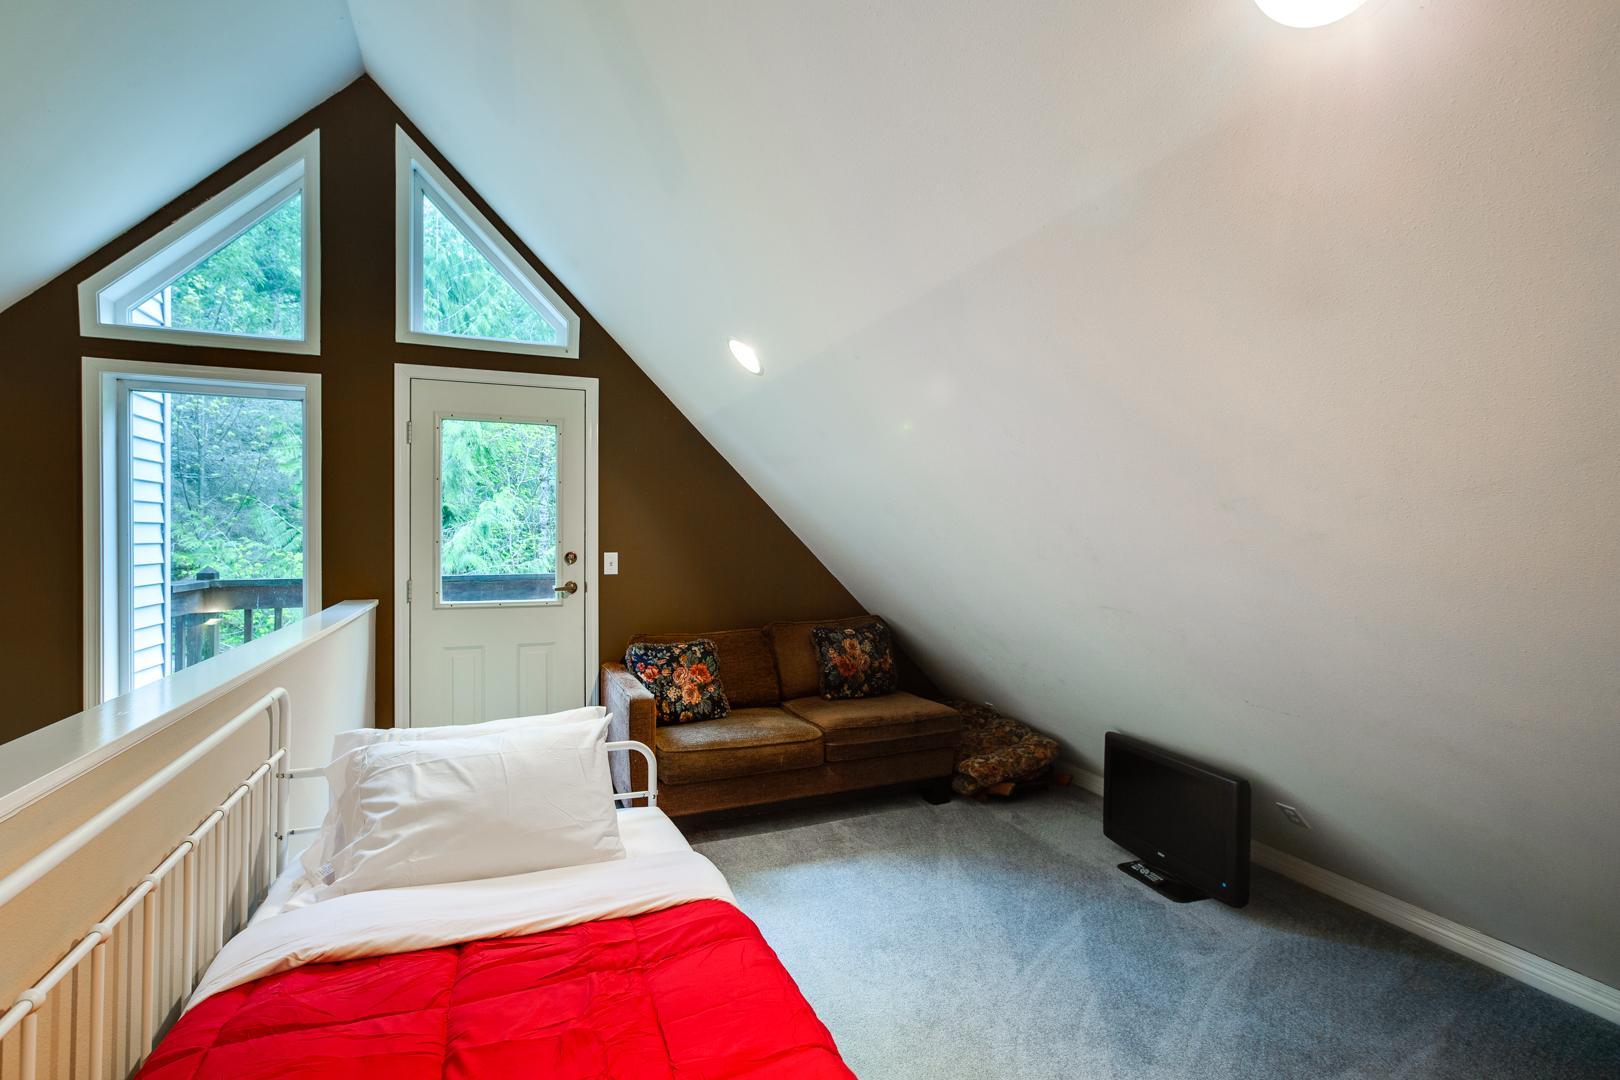 Apartment Mt  Baker Lodging Cabin  58     FIREPLACE  DISHWASHER  WIFI  SLEEPS 6  photo 4276973